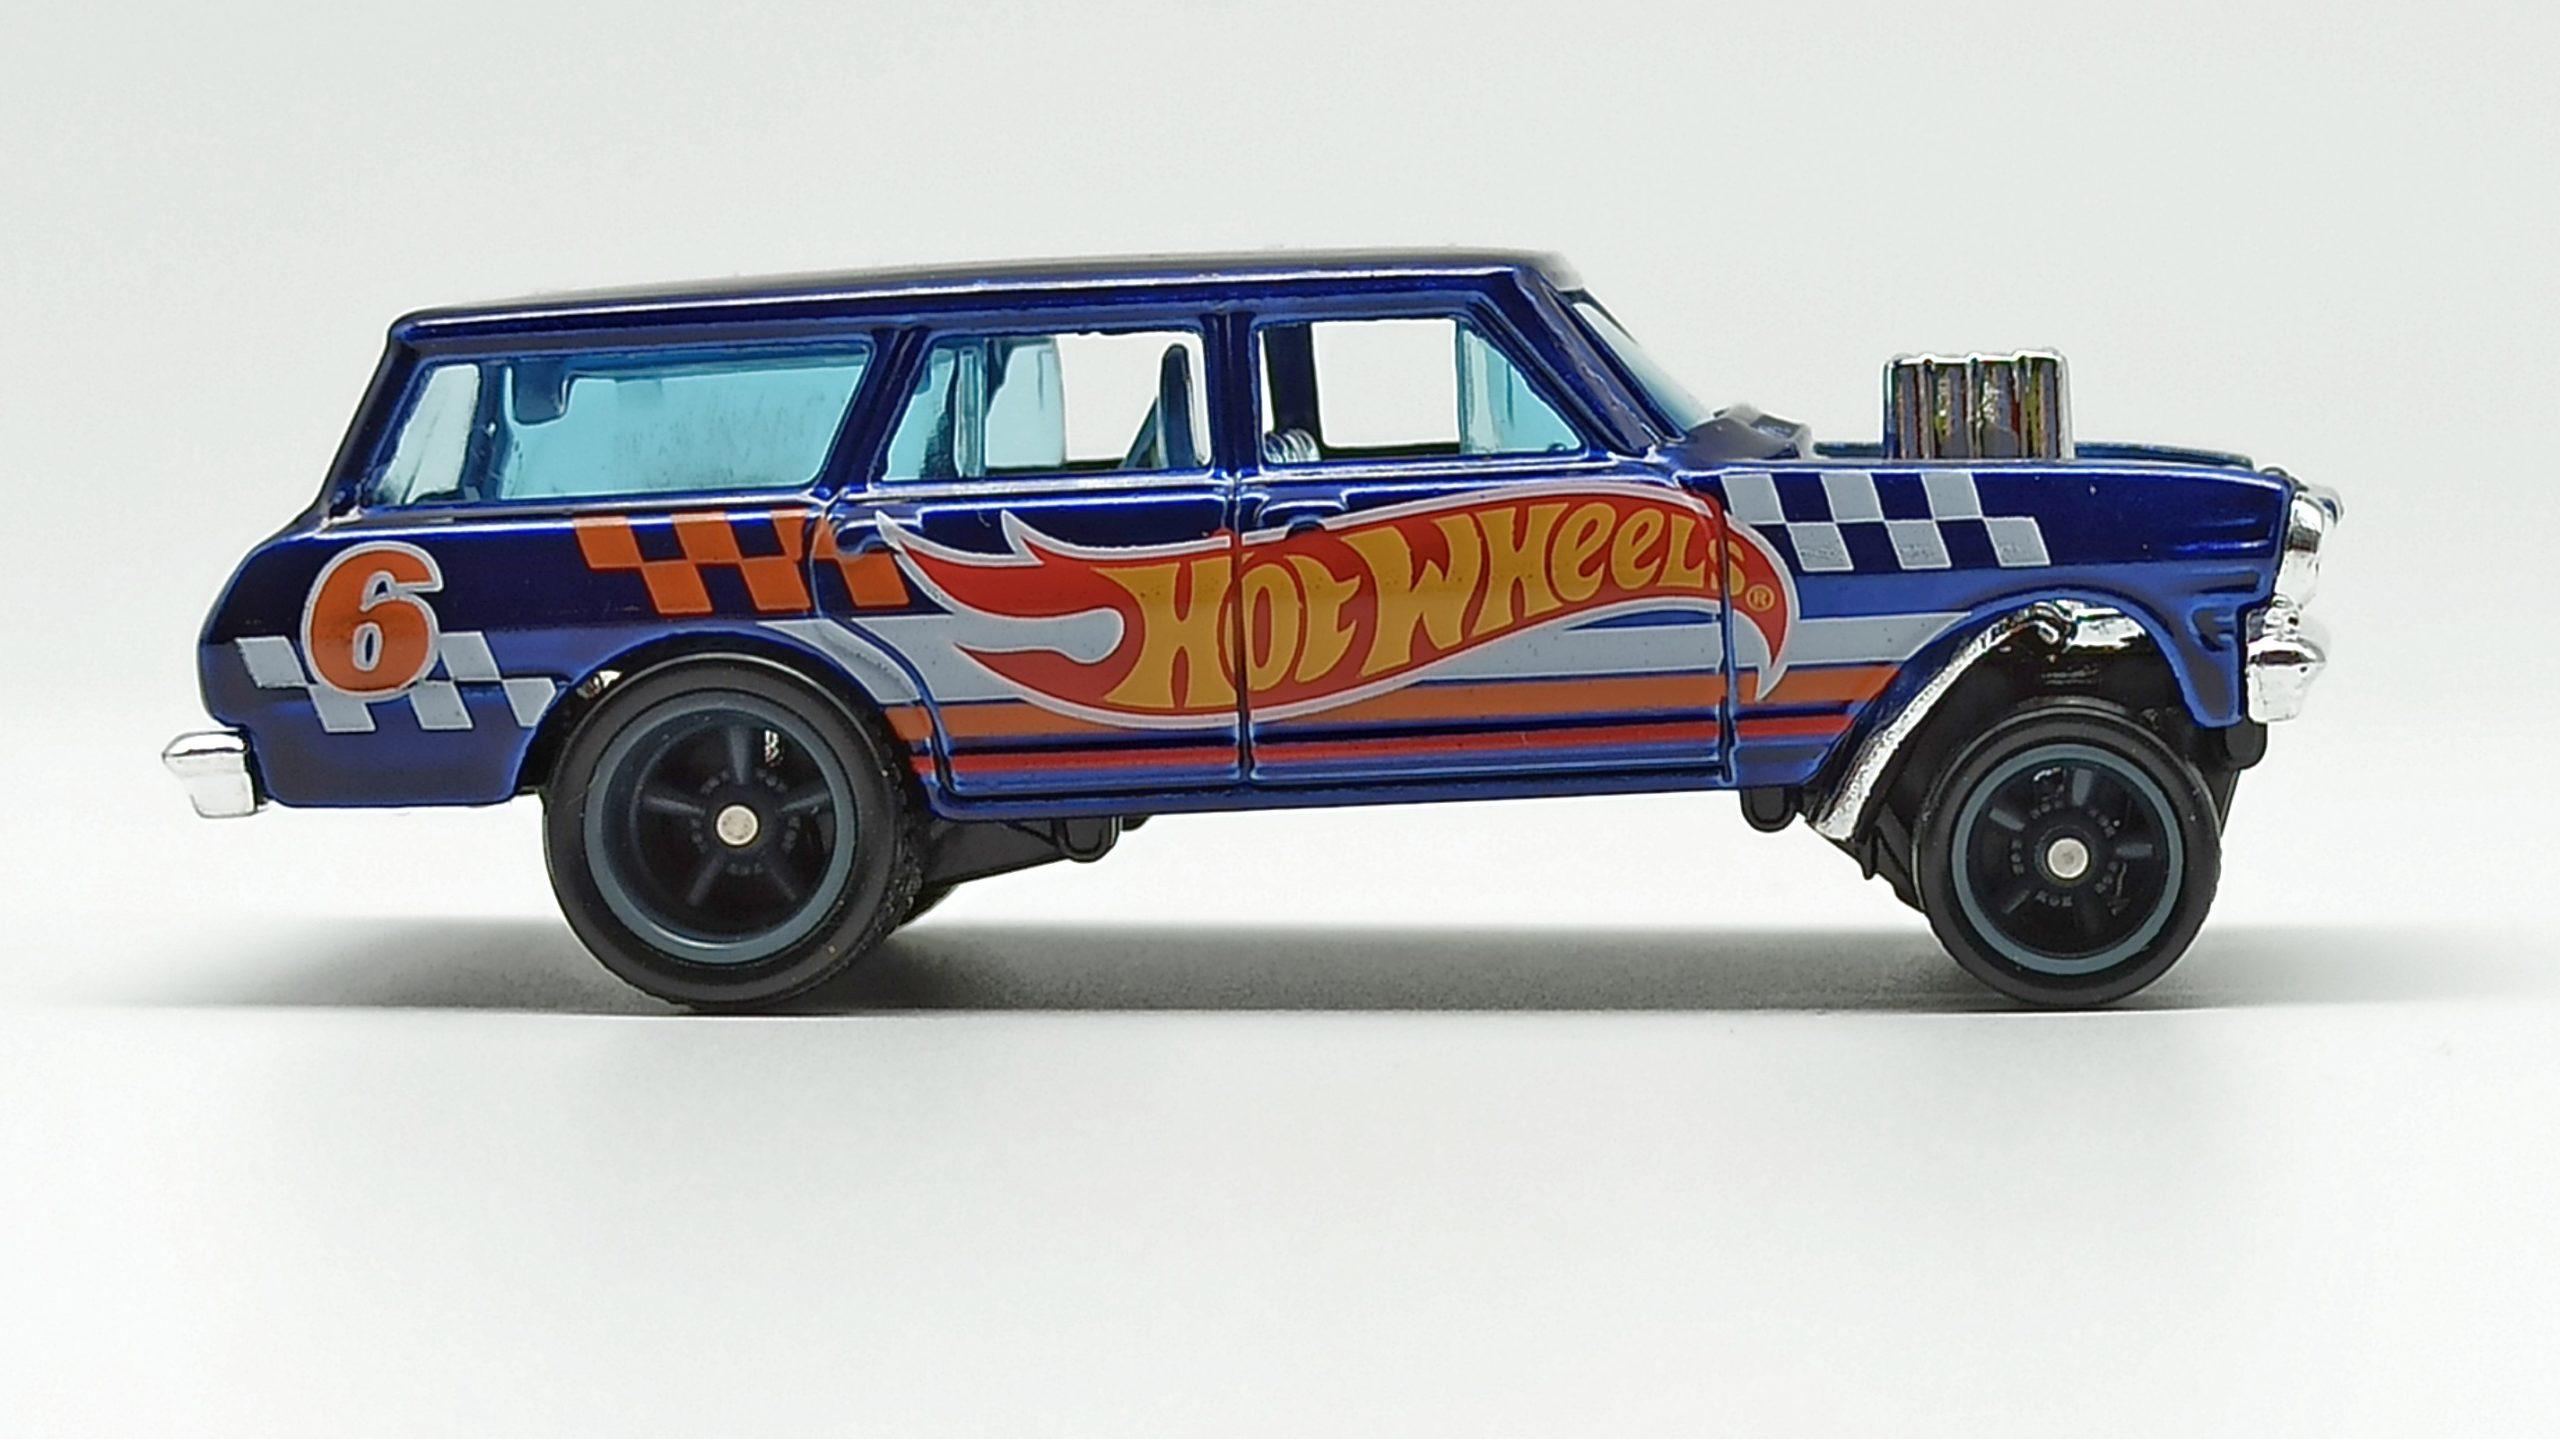 Hot Wheels '64 Chevy Nova Wagon Gasser (GTD06) 2021 (232/250) HW Race Team (7/10) spectraflame blue Super Treasure Hunt (STH) side